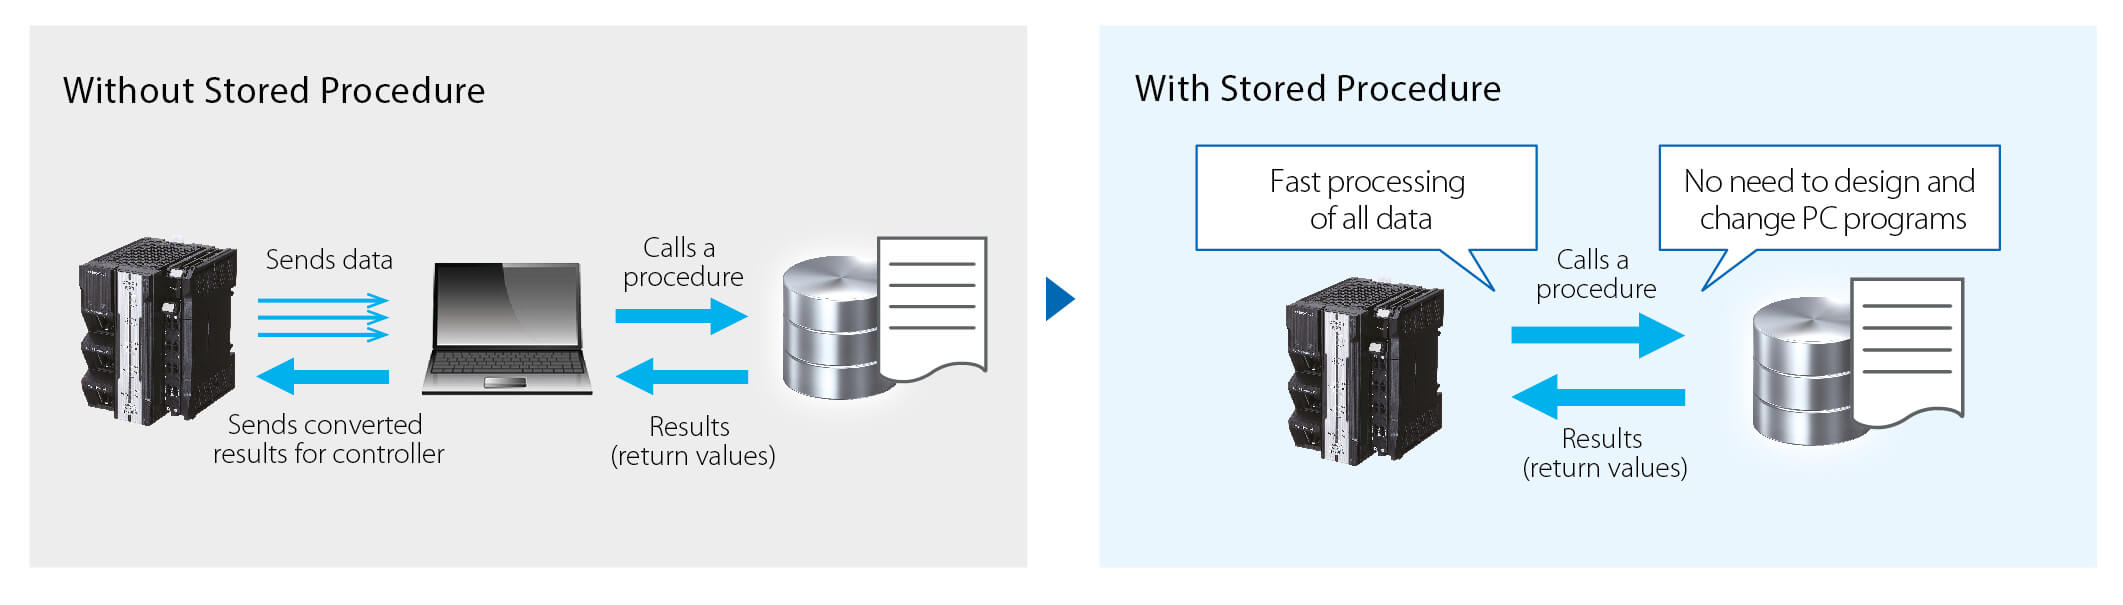 nj nx stored procedure engb prod